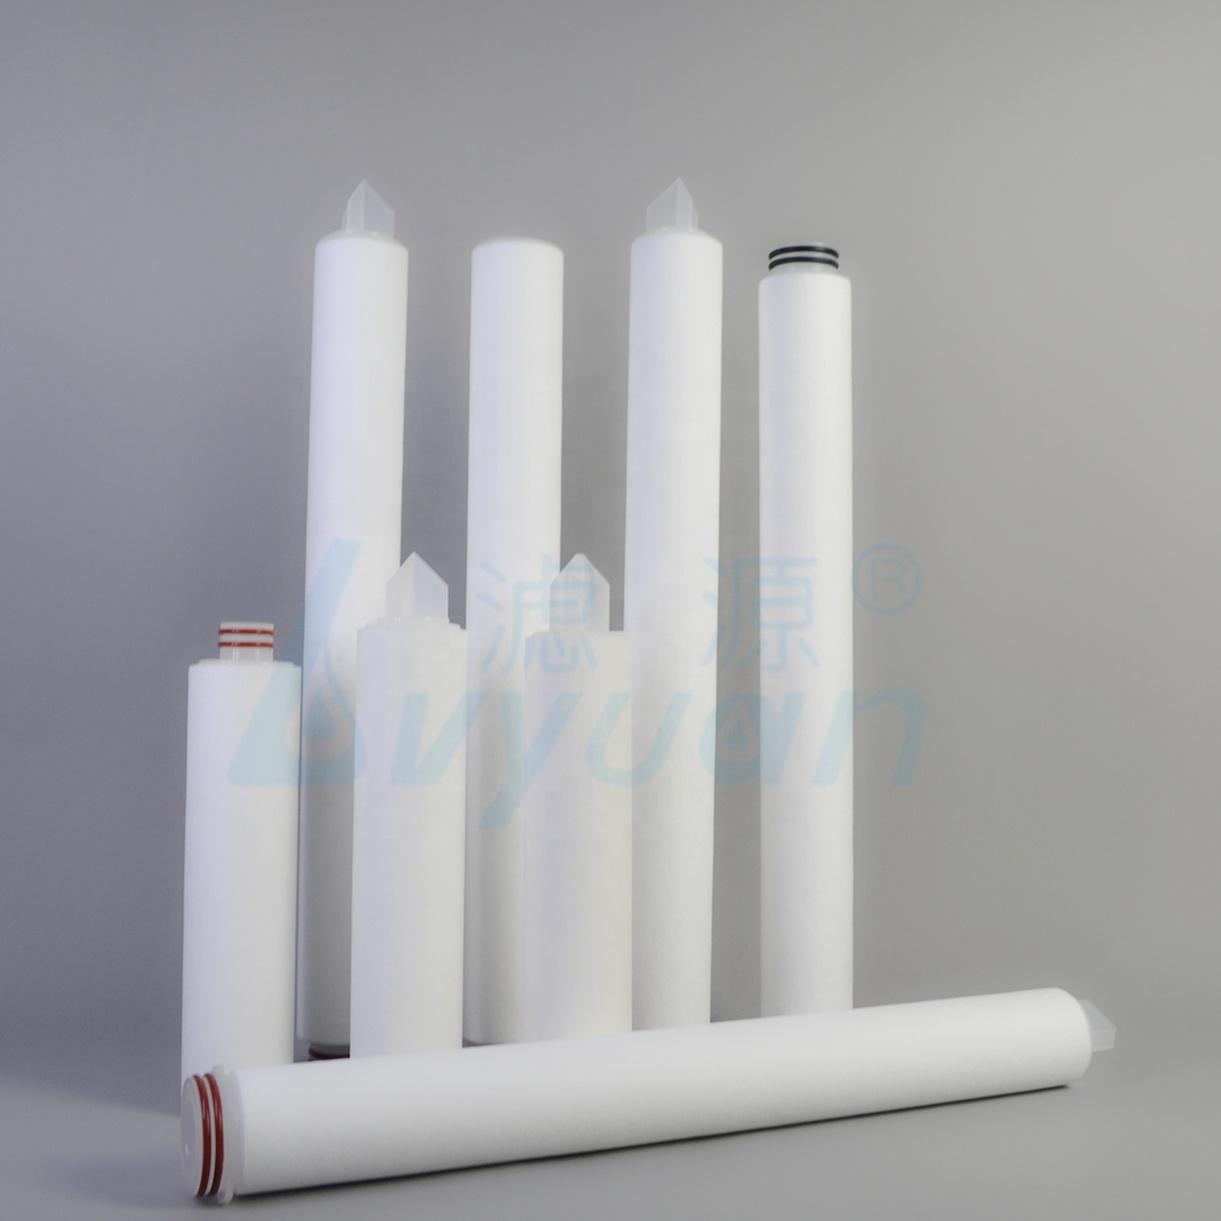 10 Micron Melt Blown Filter/PP Filter Cartridge for Water Purifiers